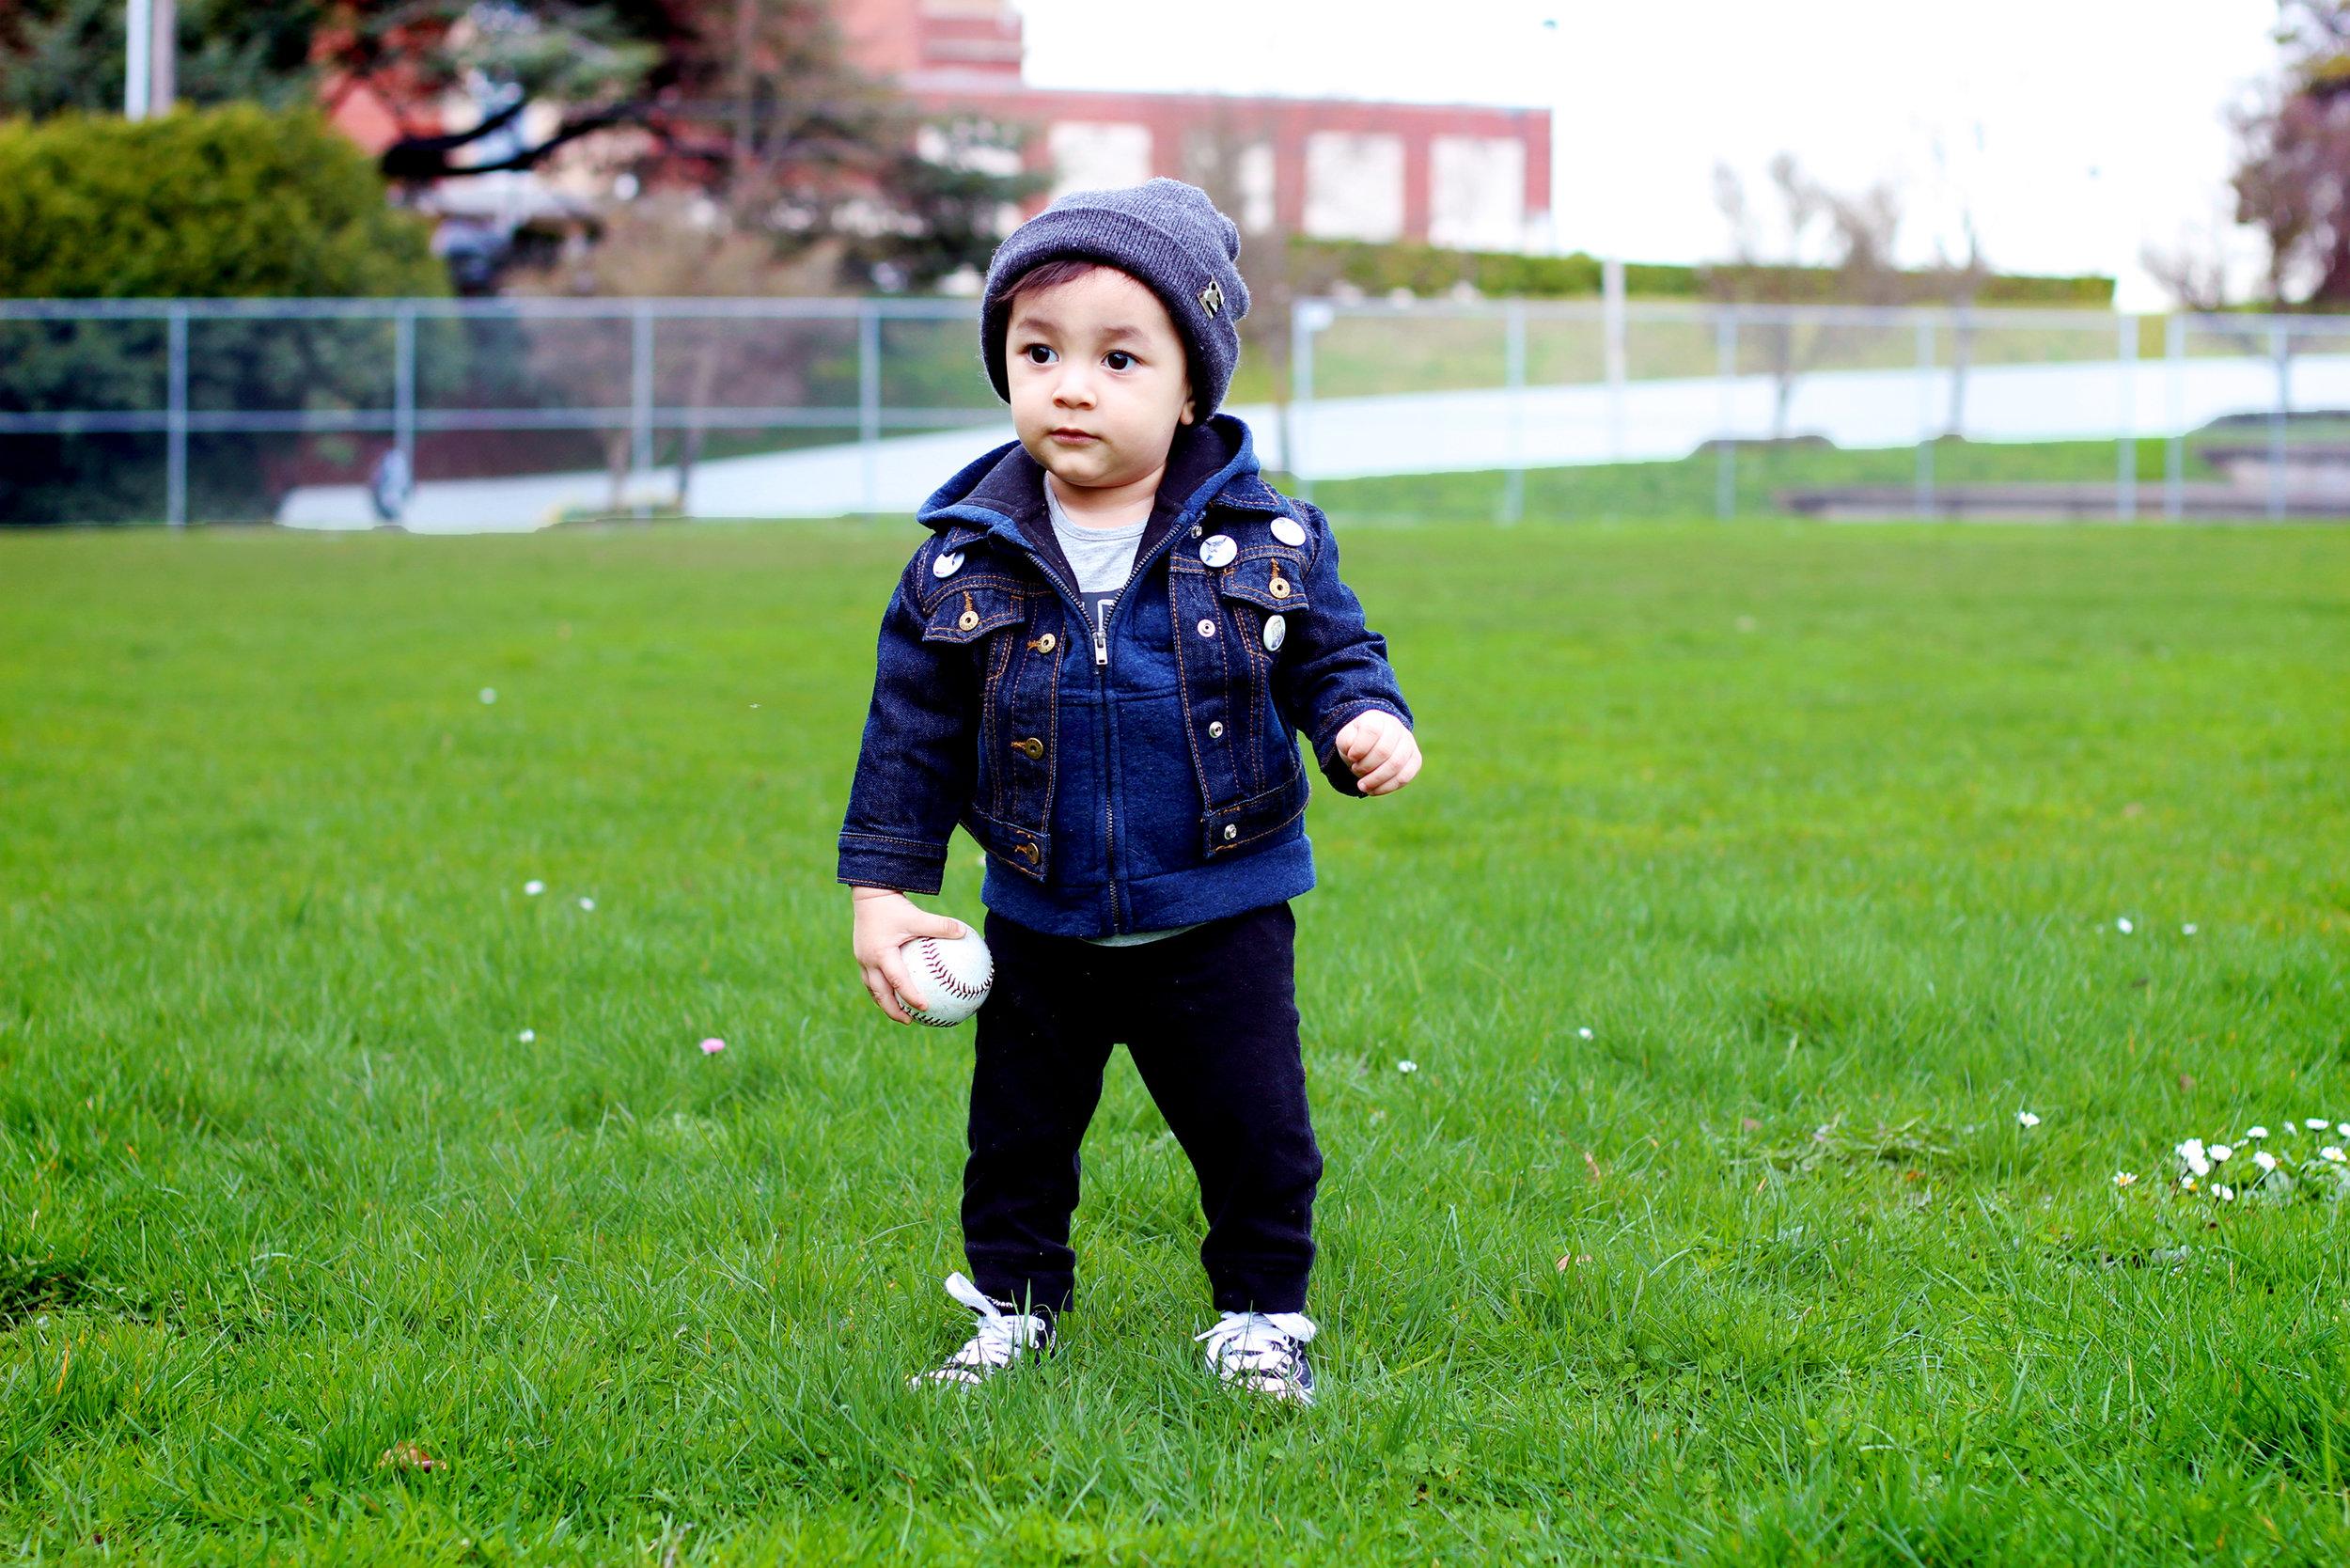 KID STYLE: MINI DENIM JACKET + MINI PINS — All Kids Are Gifted